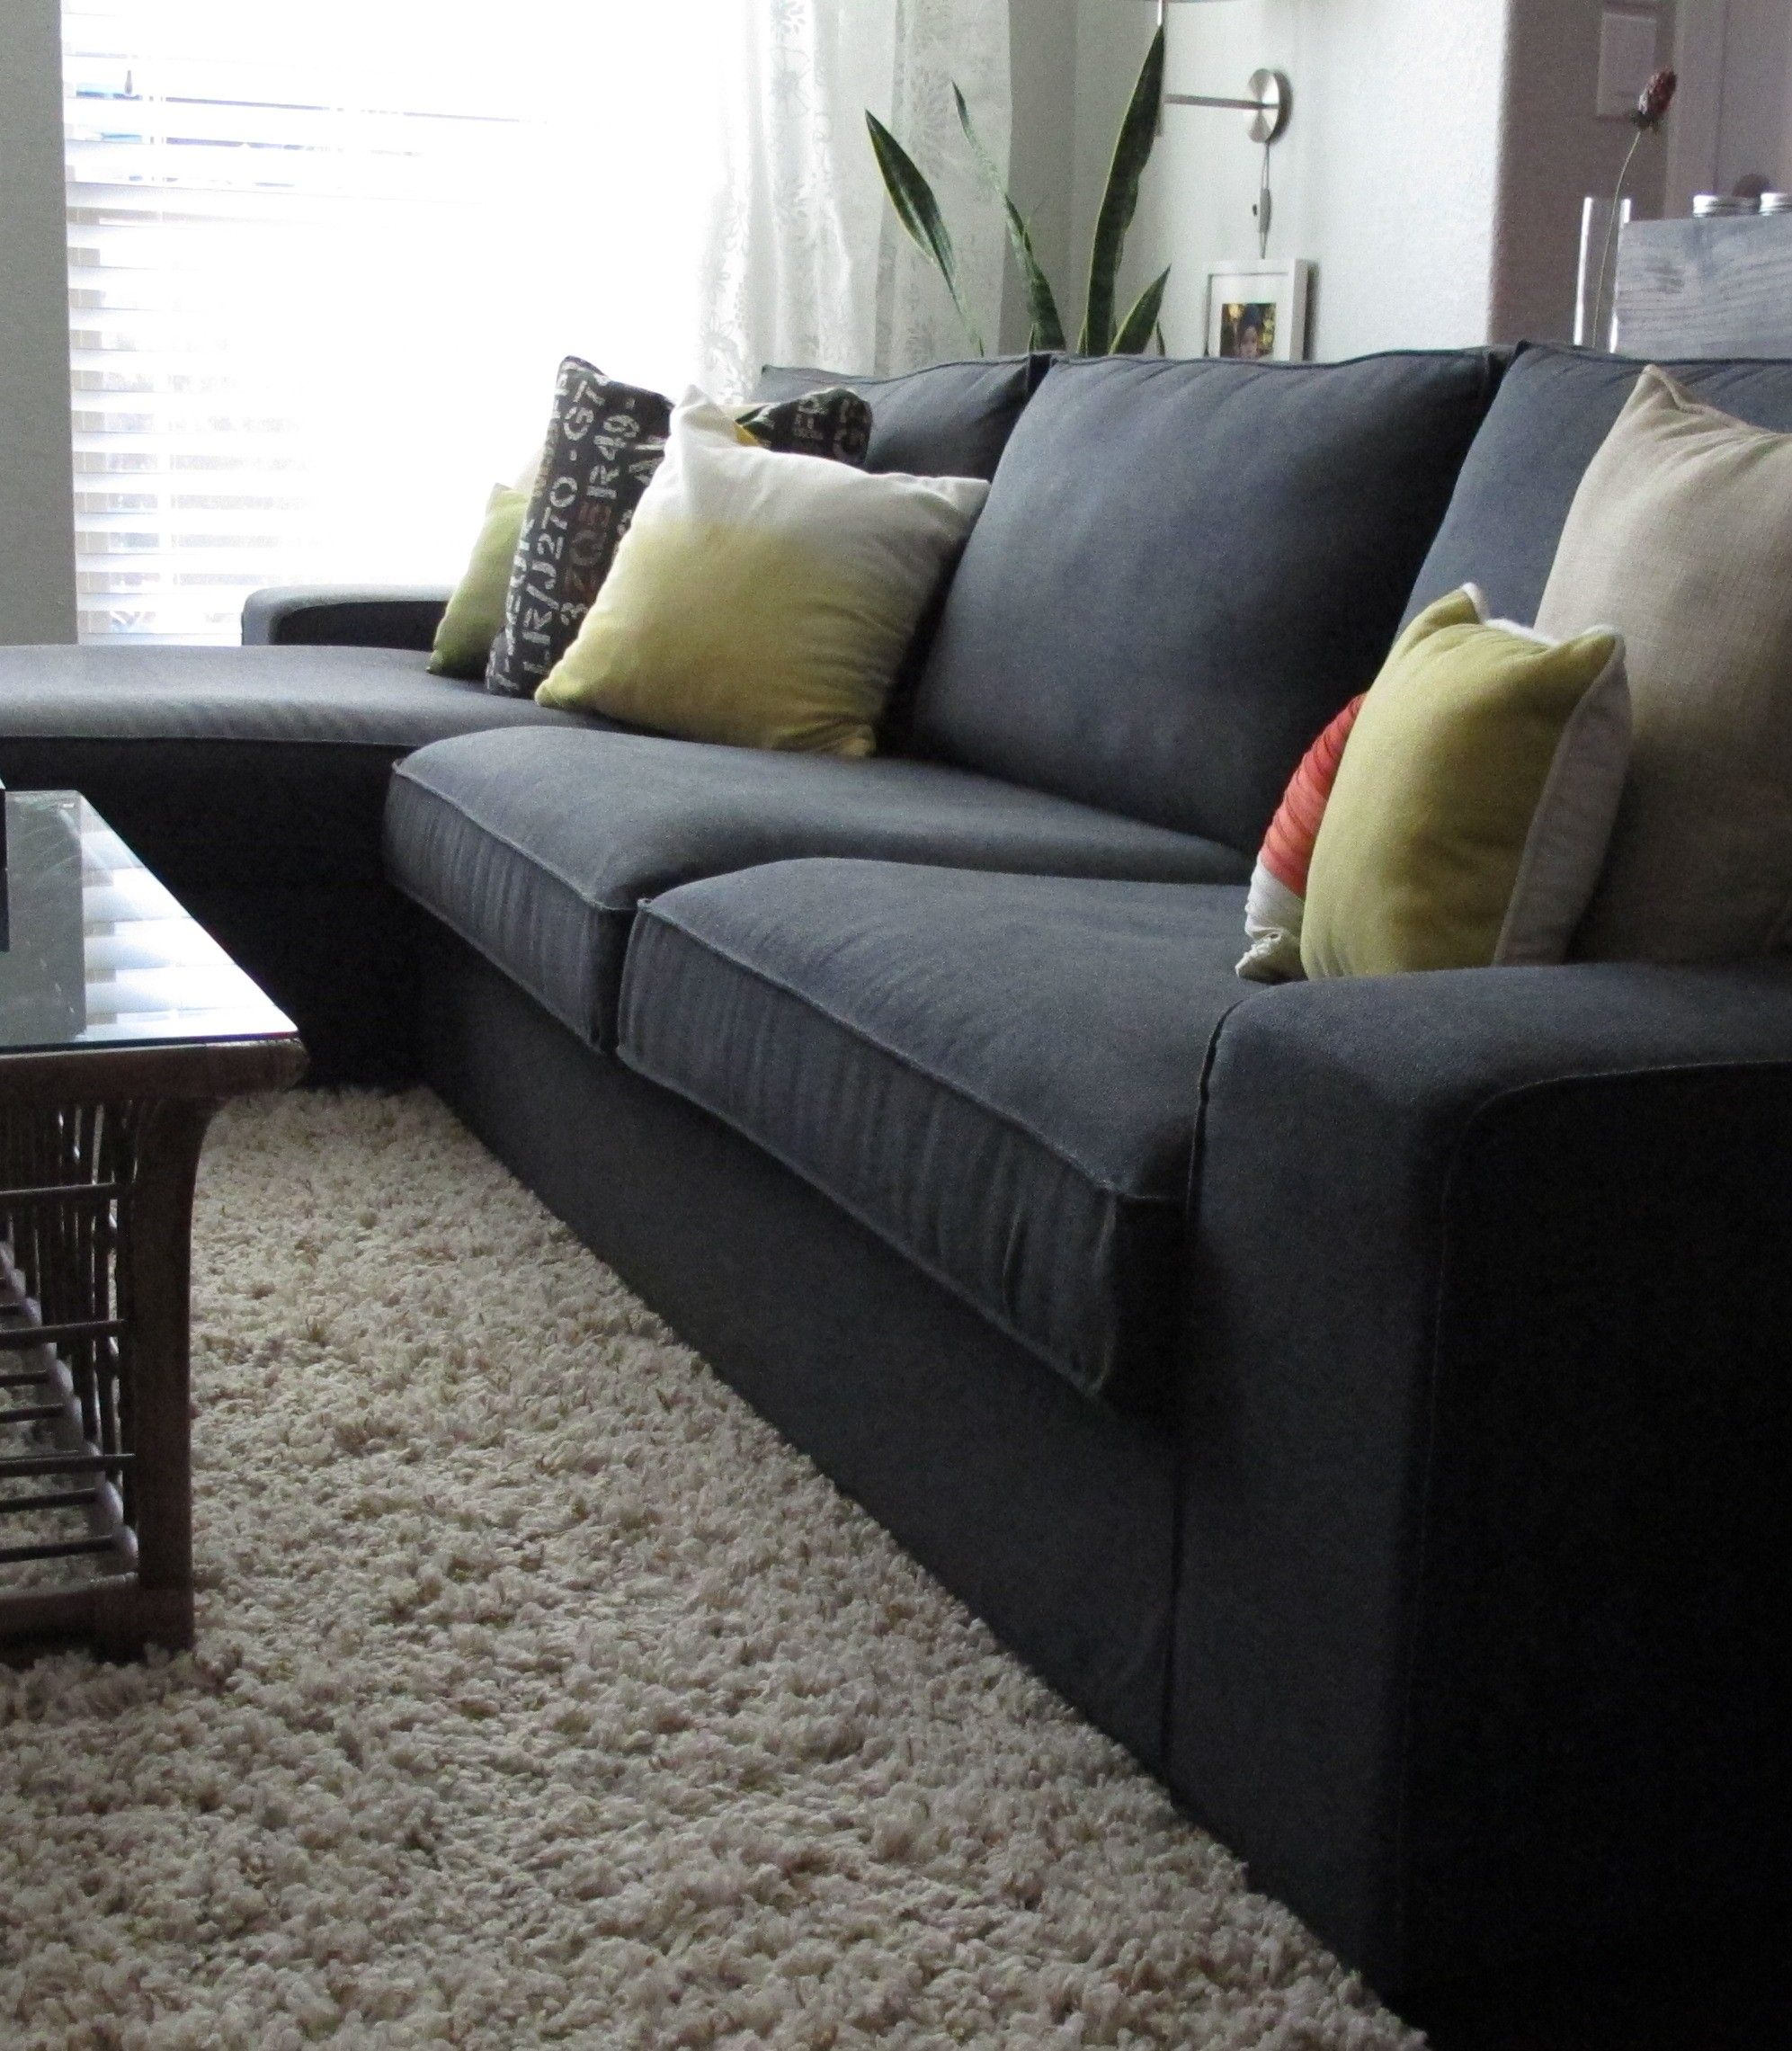 kivik dansbo gray  ideas  Sofa Ikea sofa Living room furniture